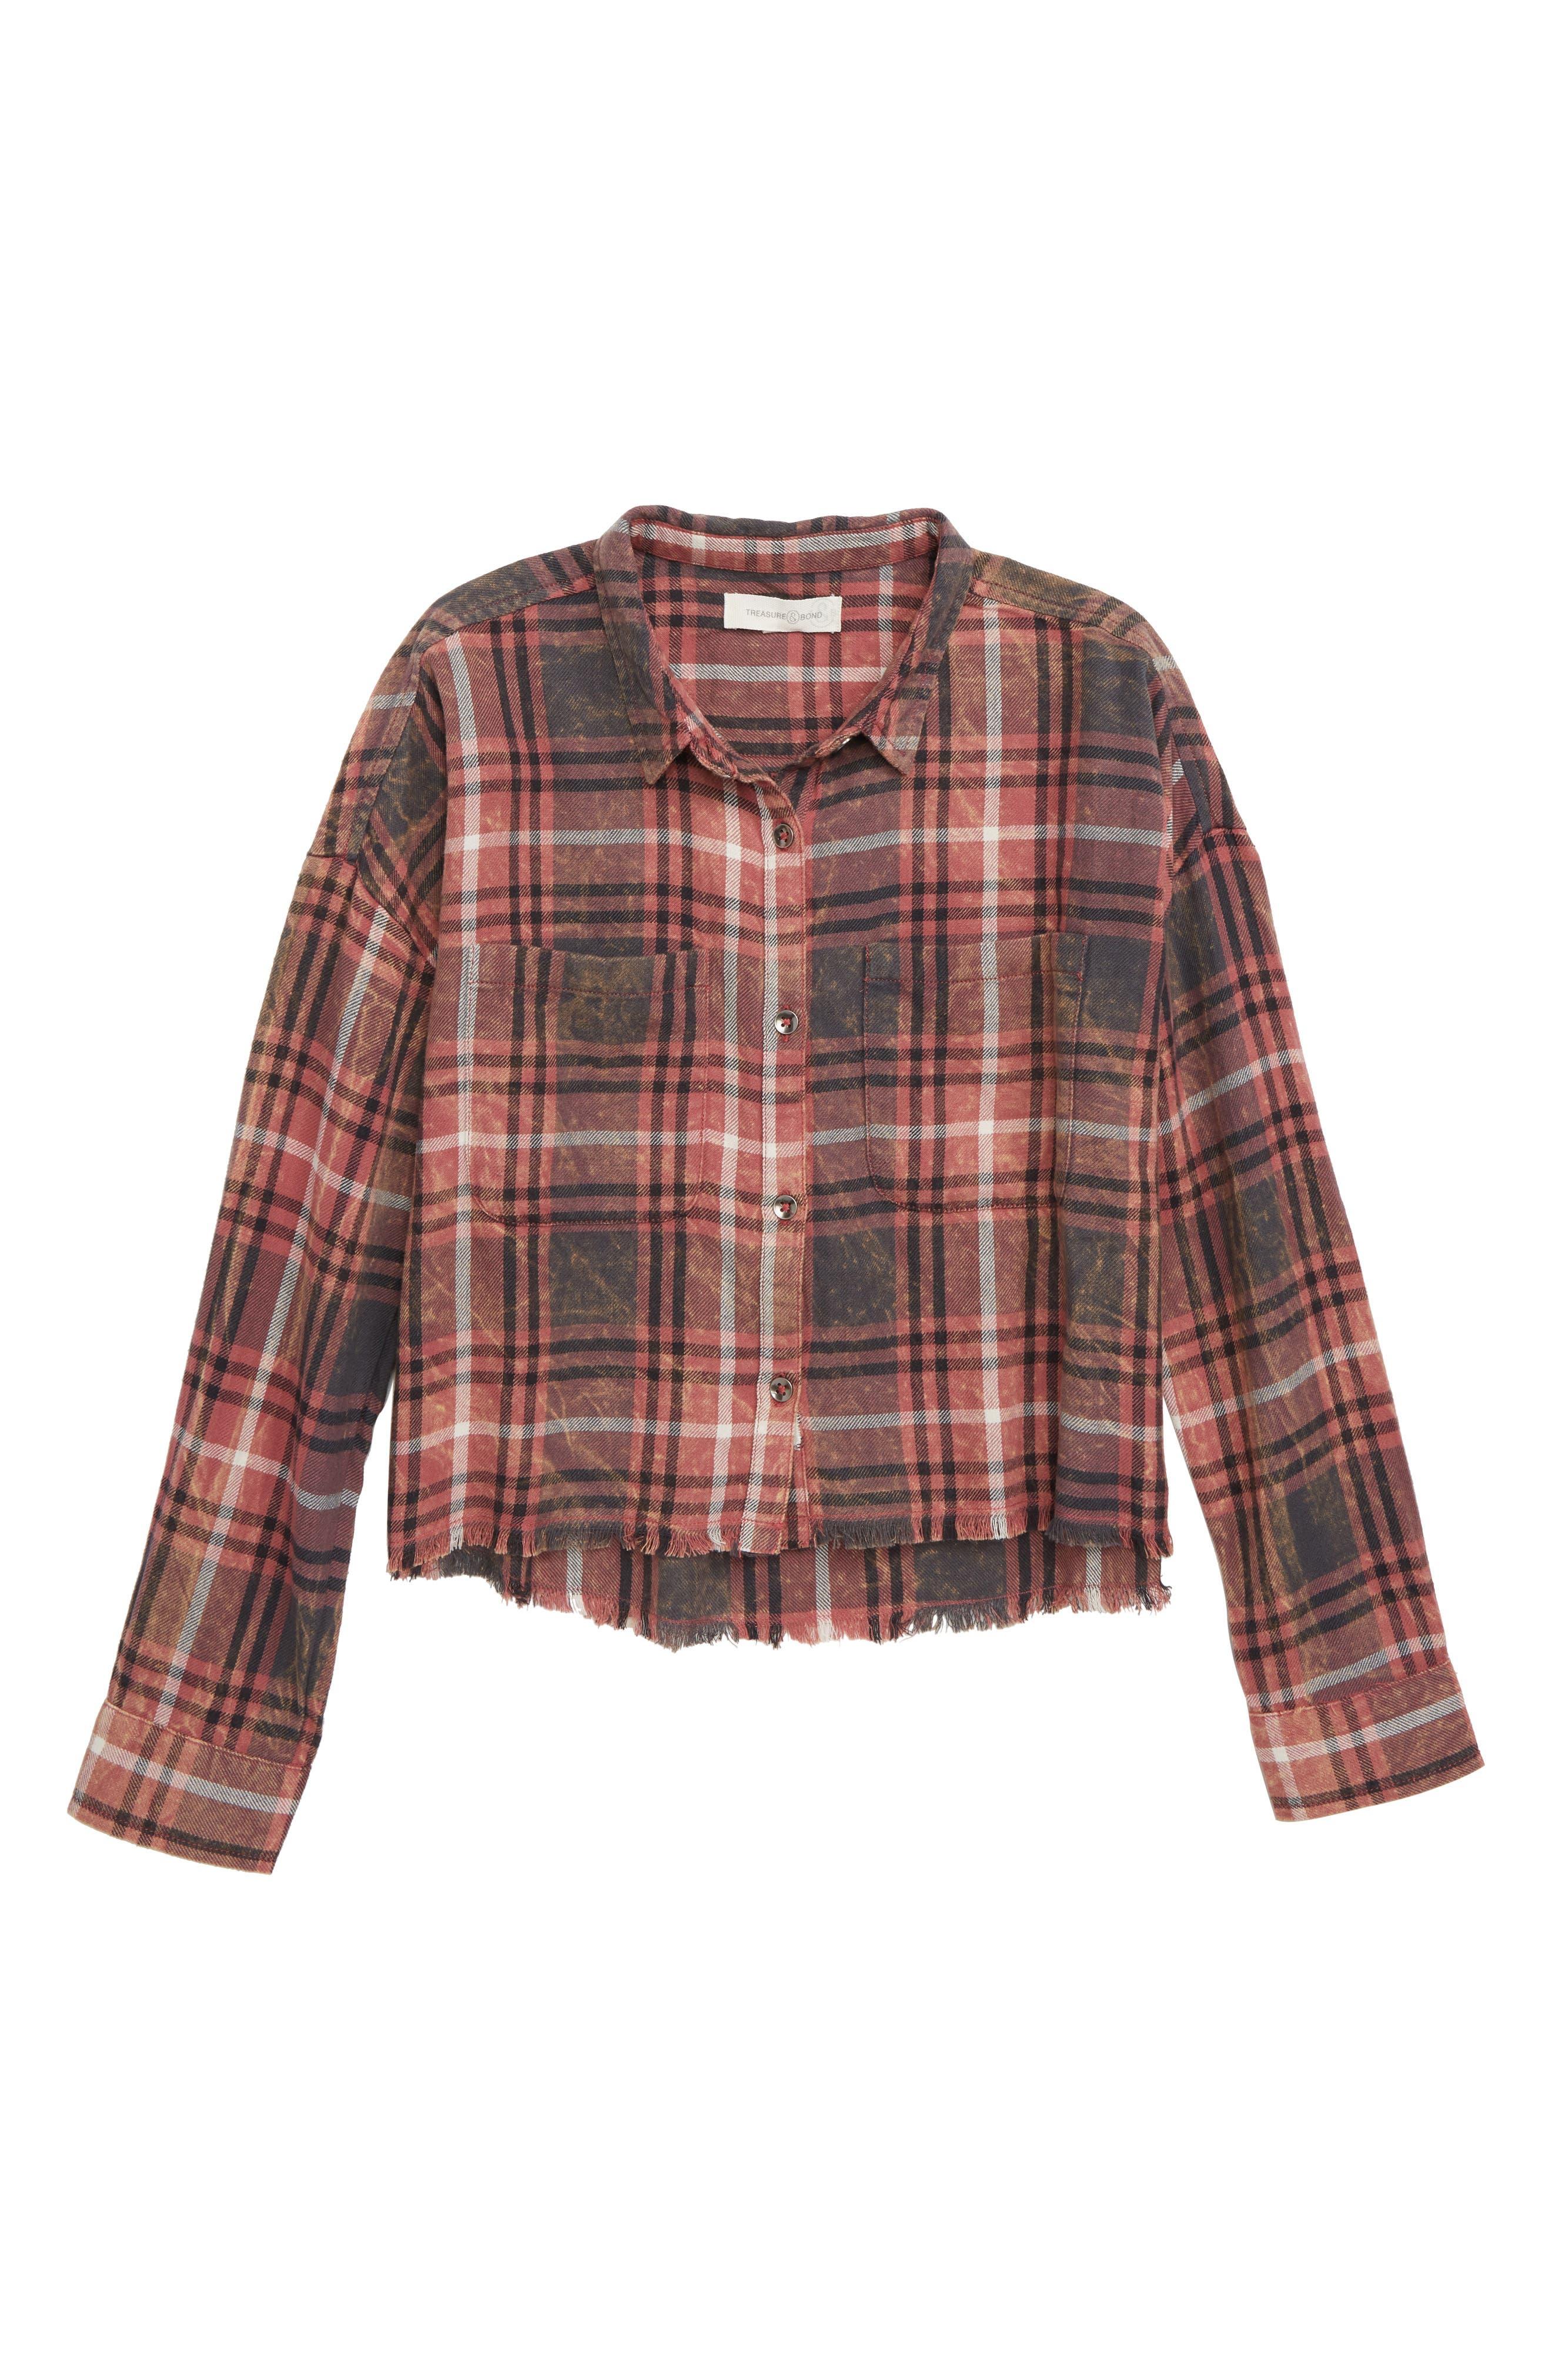 Cutoff Plaid Shirt,                         Main,                         color, PINK DECO VINTAGE PLAID